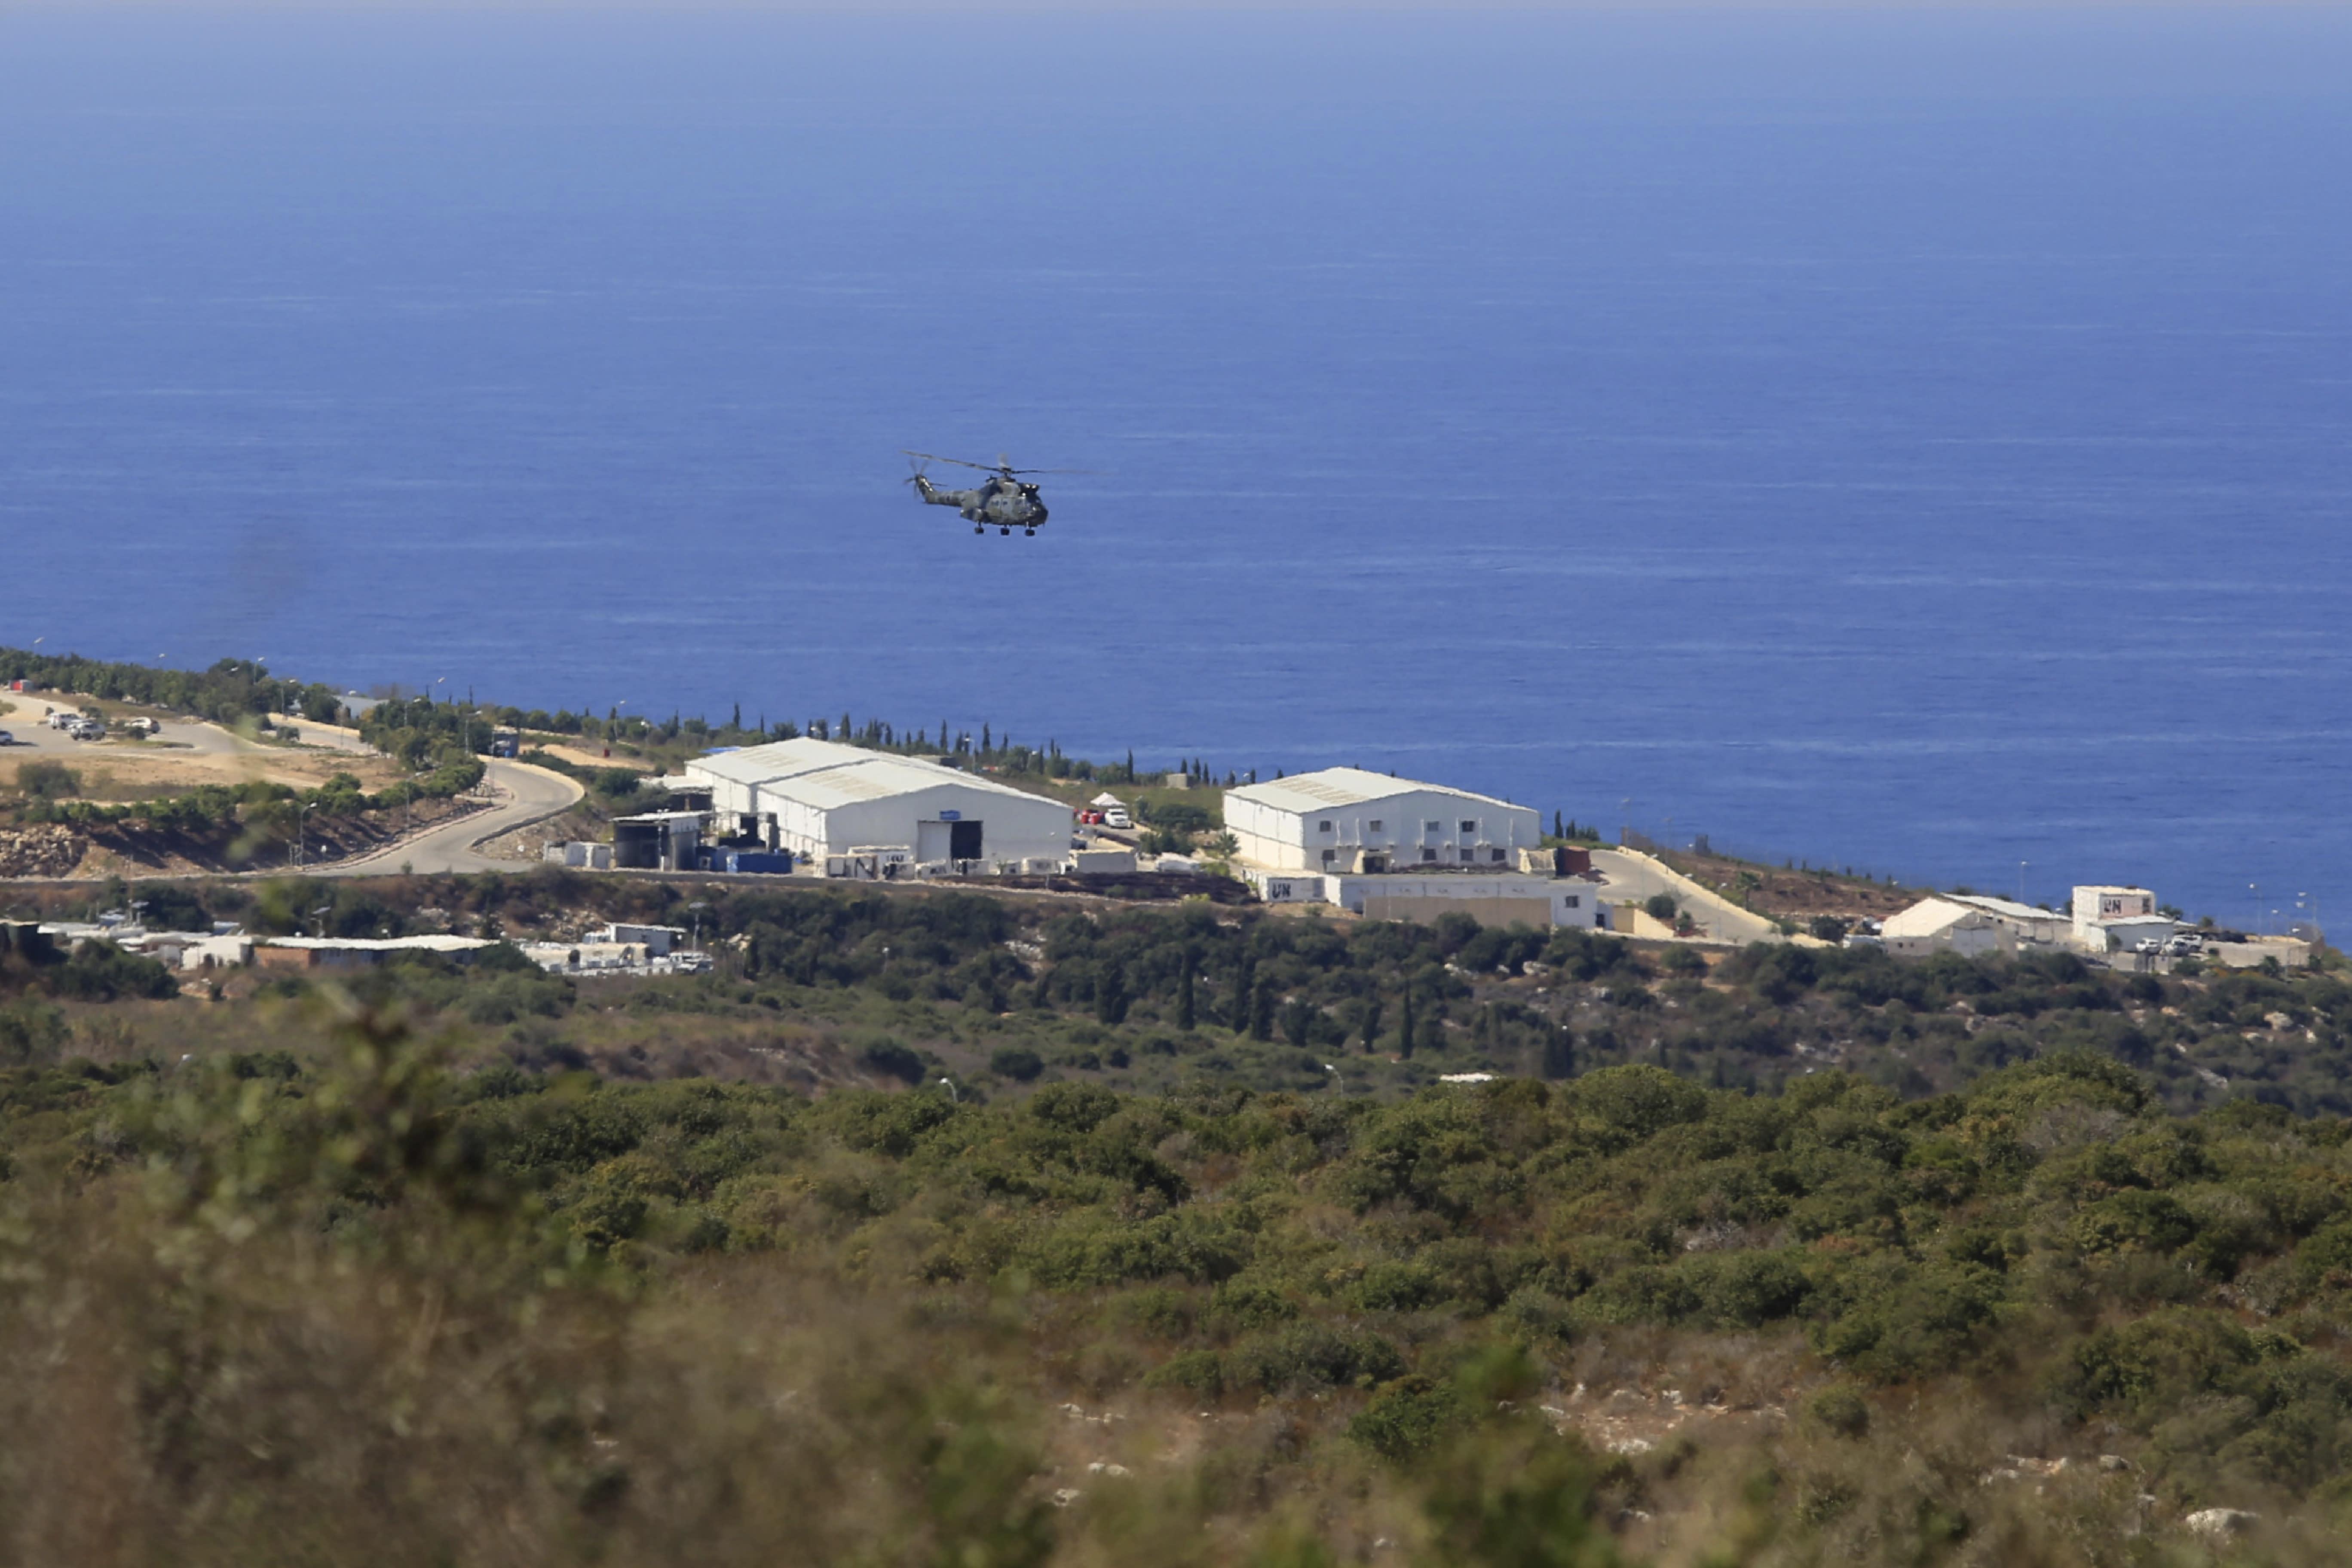 Israel-Lebanon maritime talks productive, mediators say